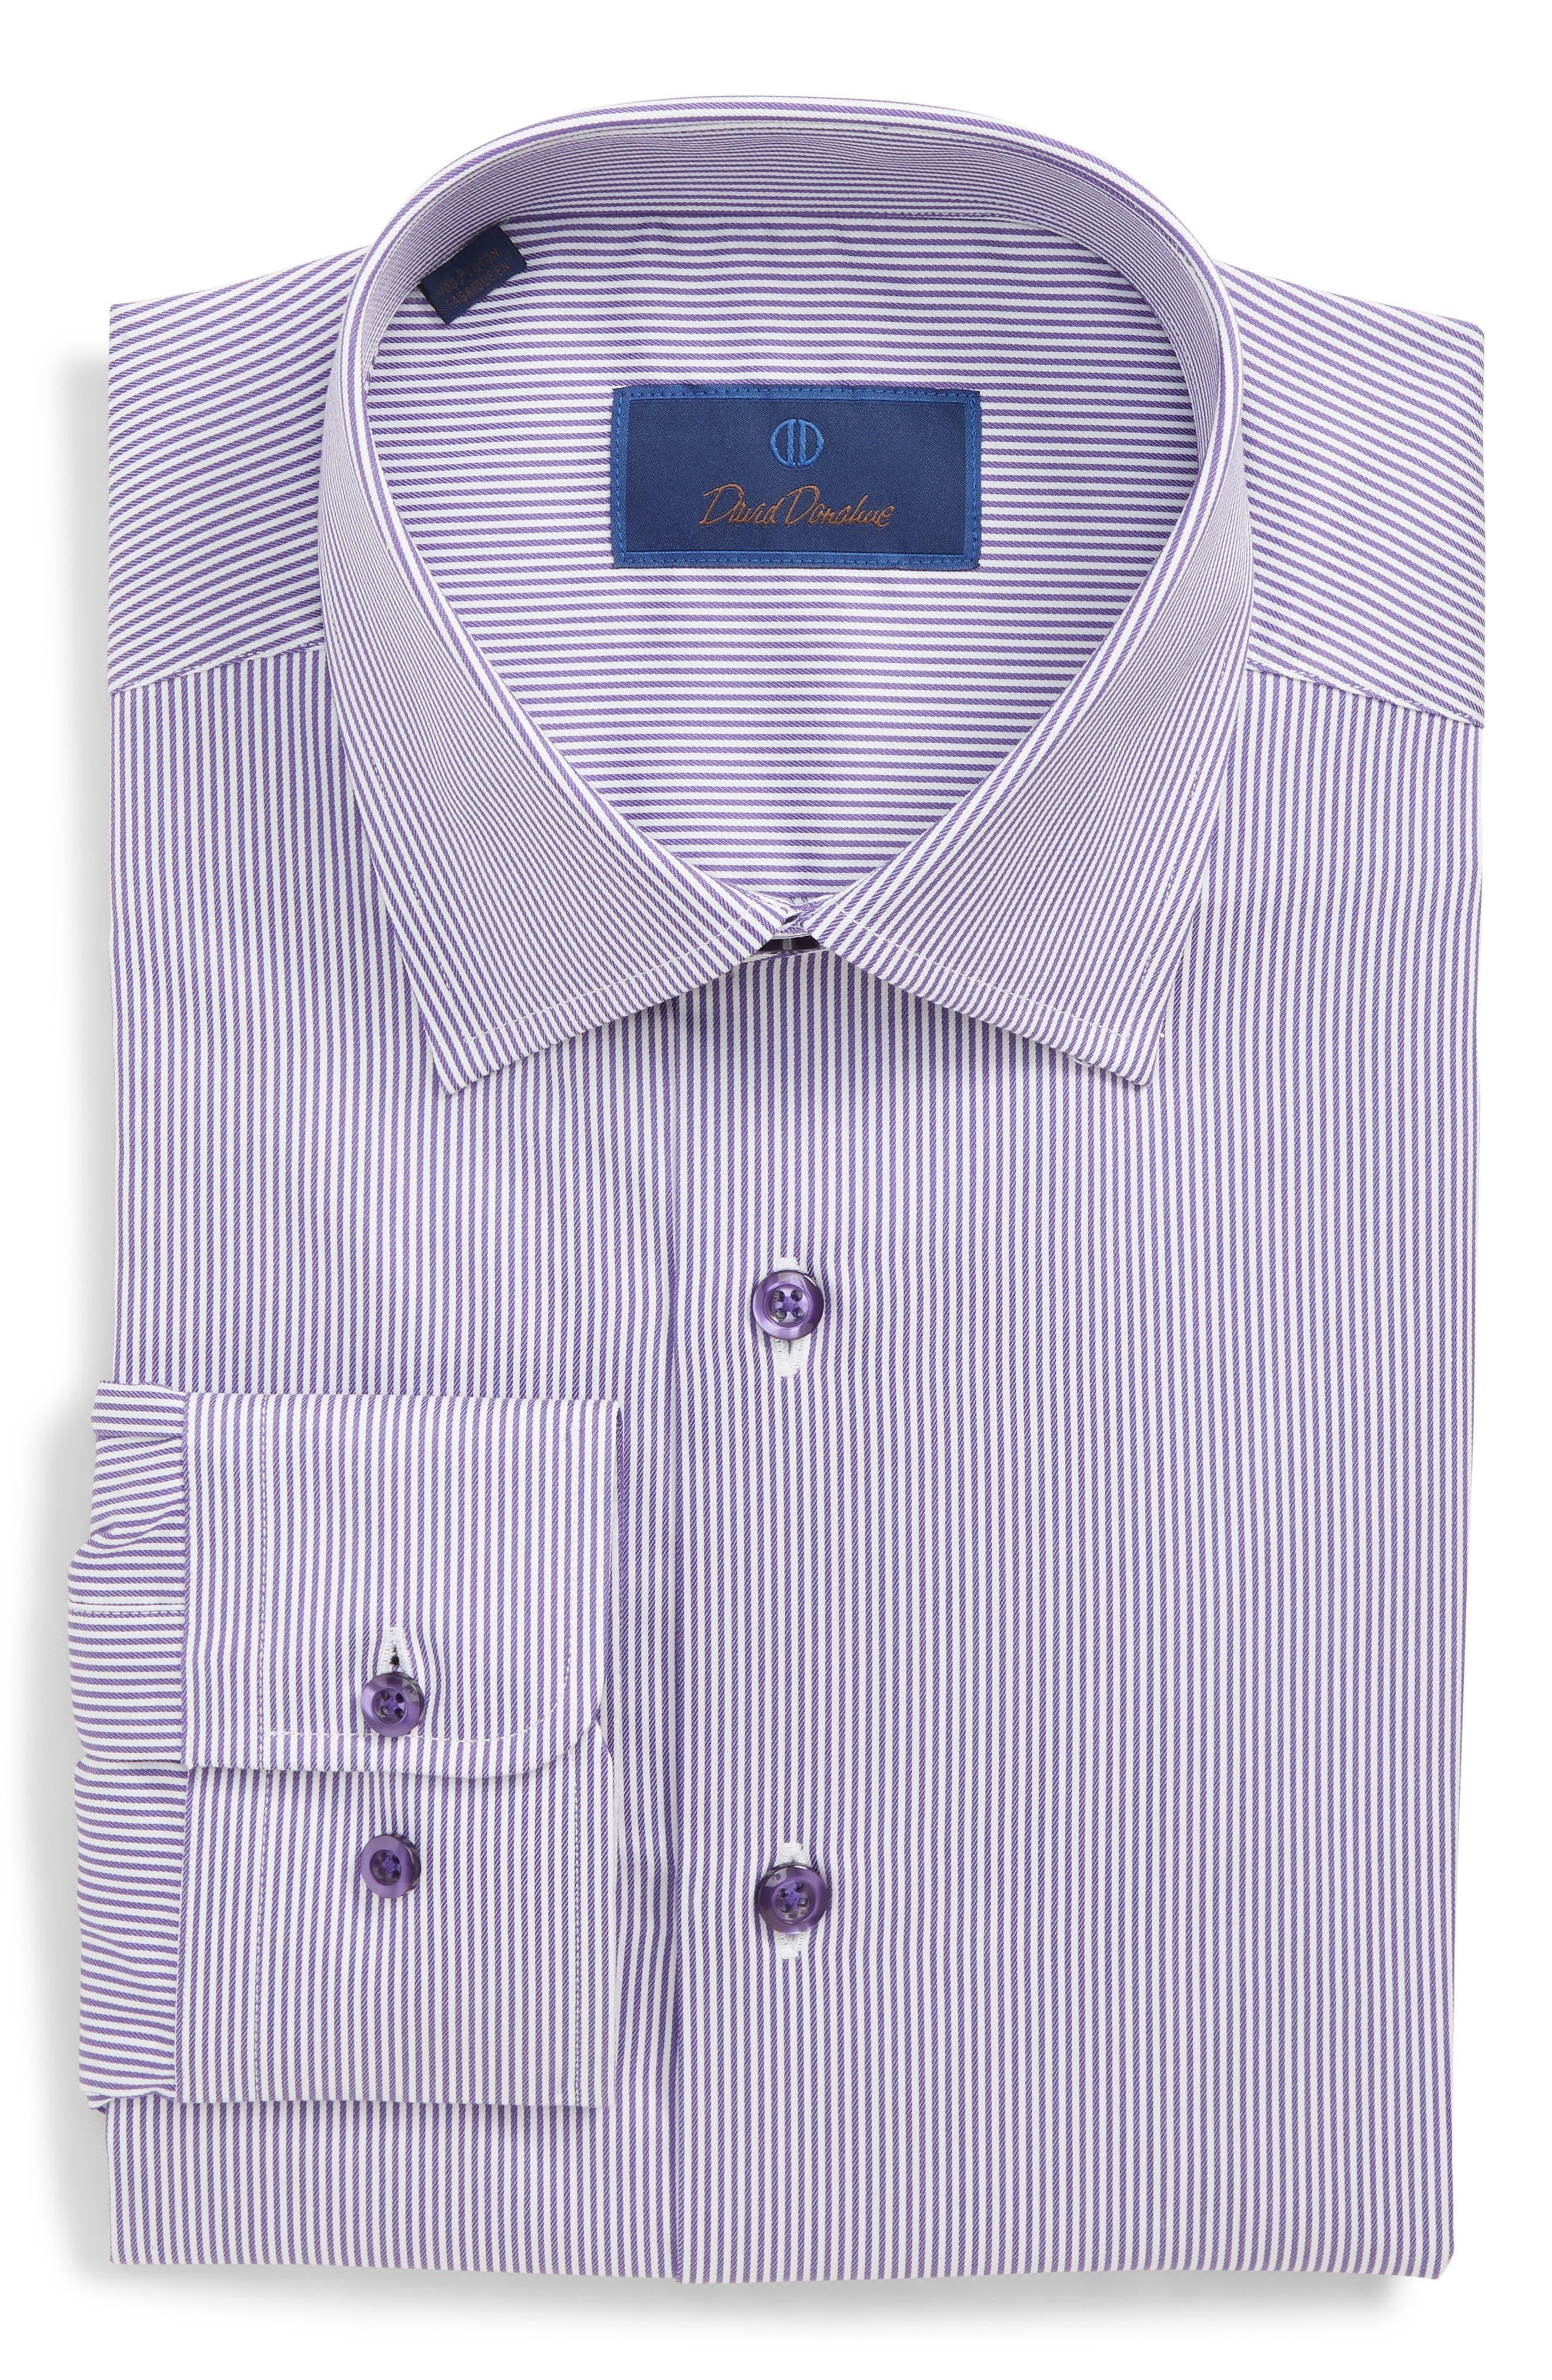 Regular Fit Stripe Dress Shirt,                             Main thumbnail 1, color,                             500